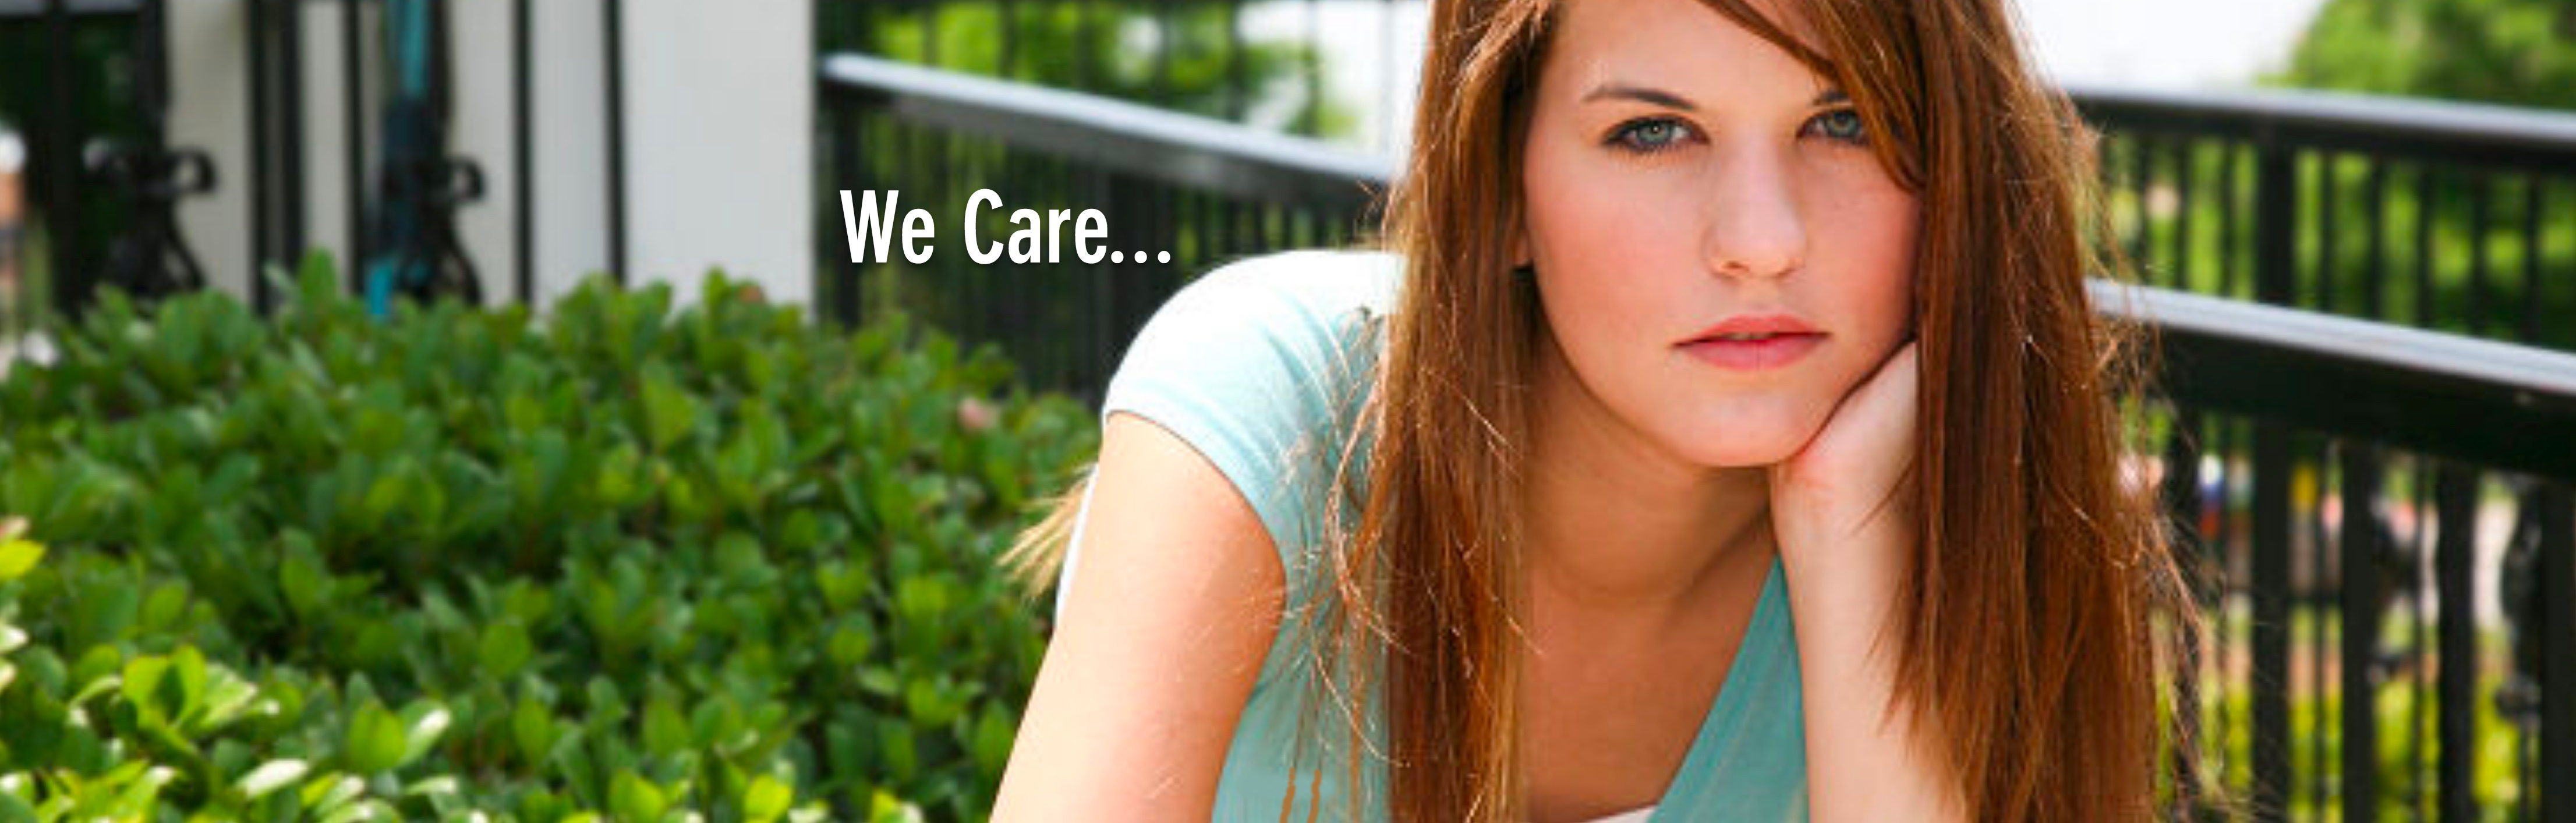 we care 1